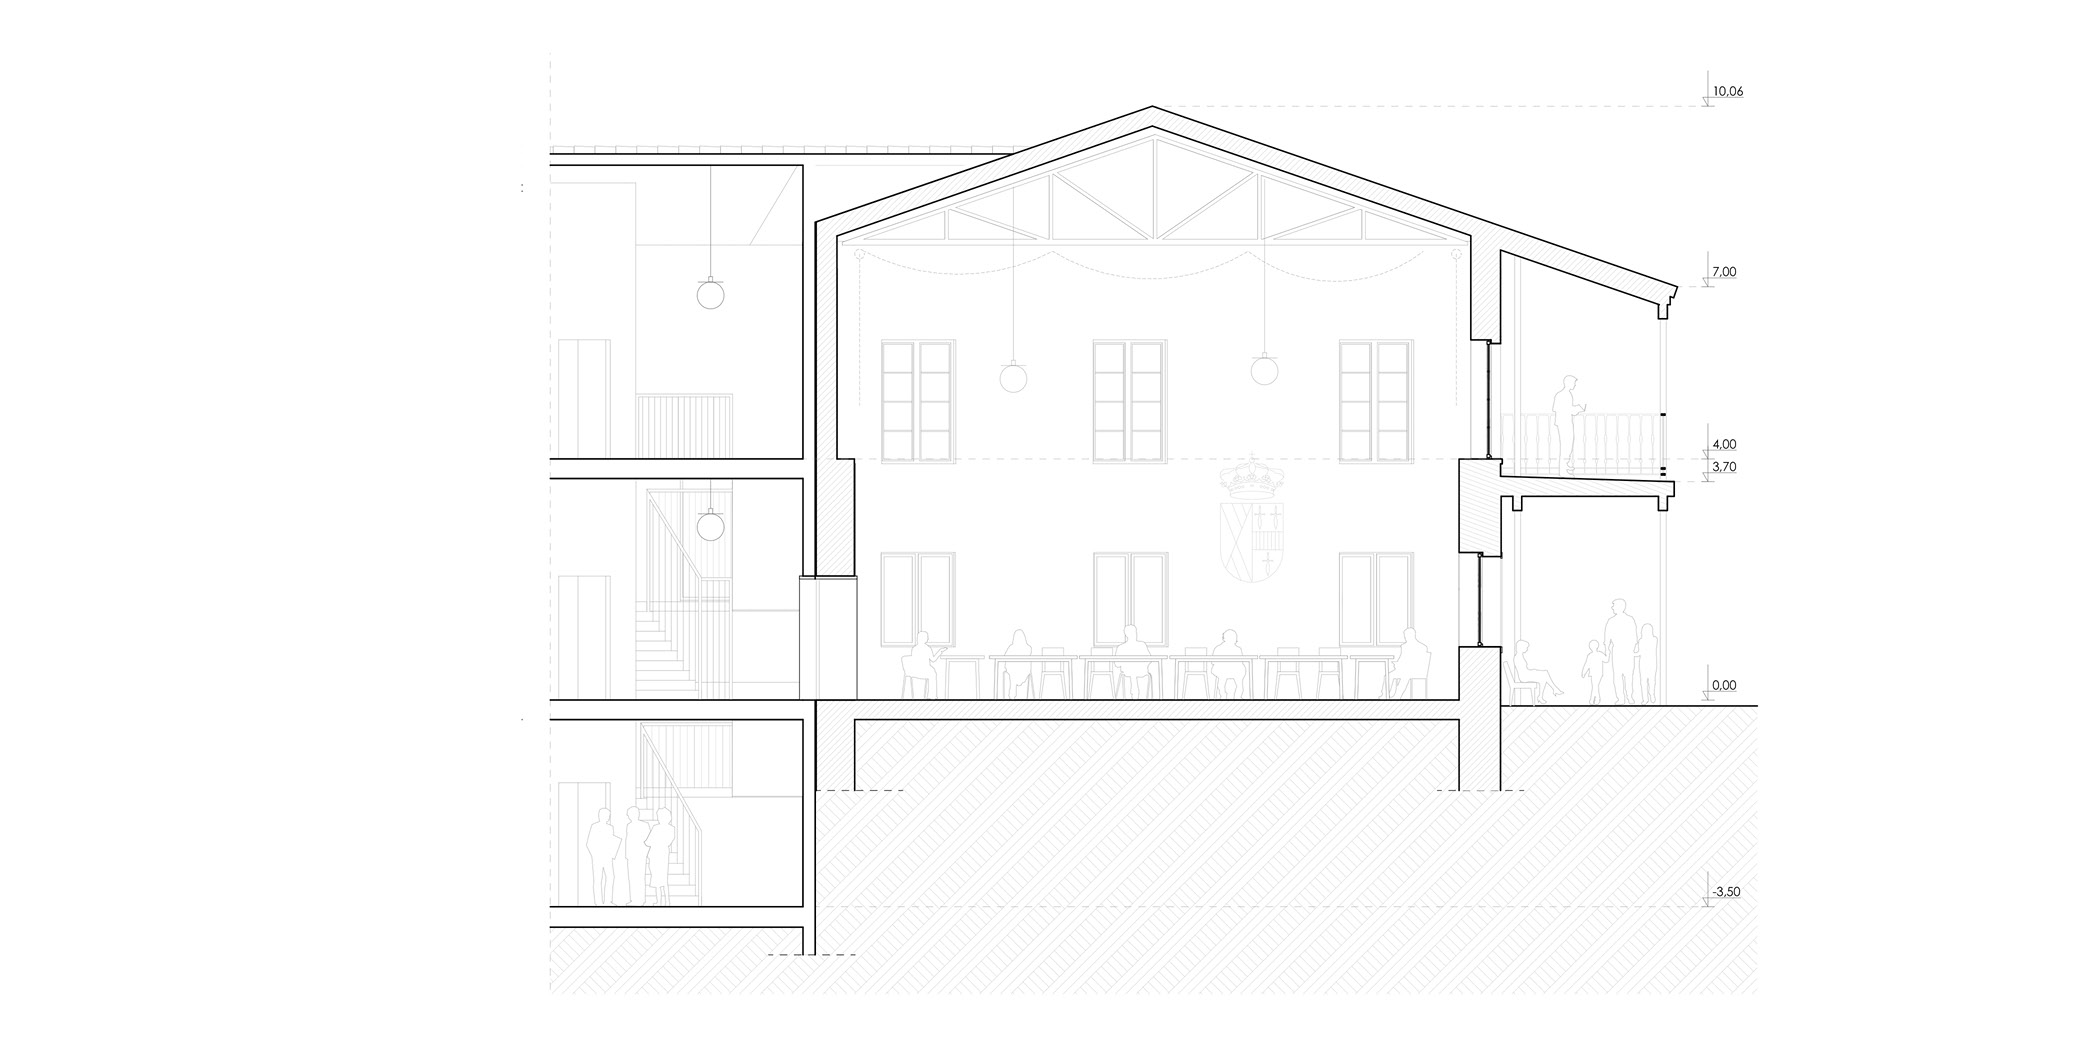 Daganzo City Hall Extention Architecture Arquitectura OCA ARCHITECTS OCA arquitectas Hernan Lleida Bernardo Garcia_9